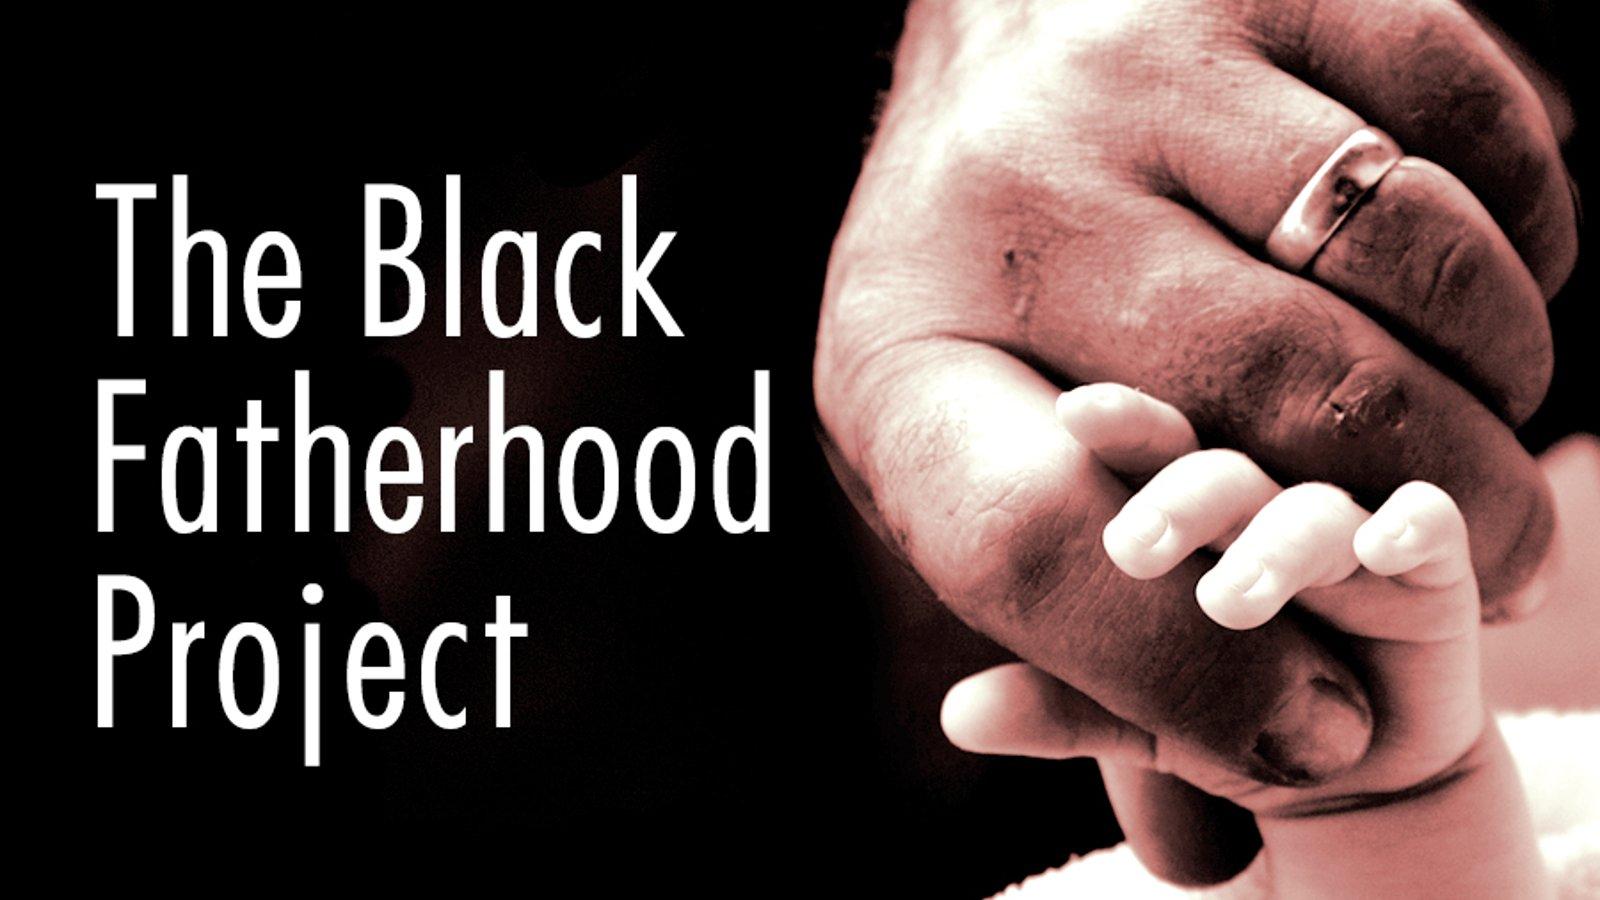 The Black Fatherhood Project